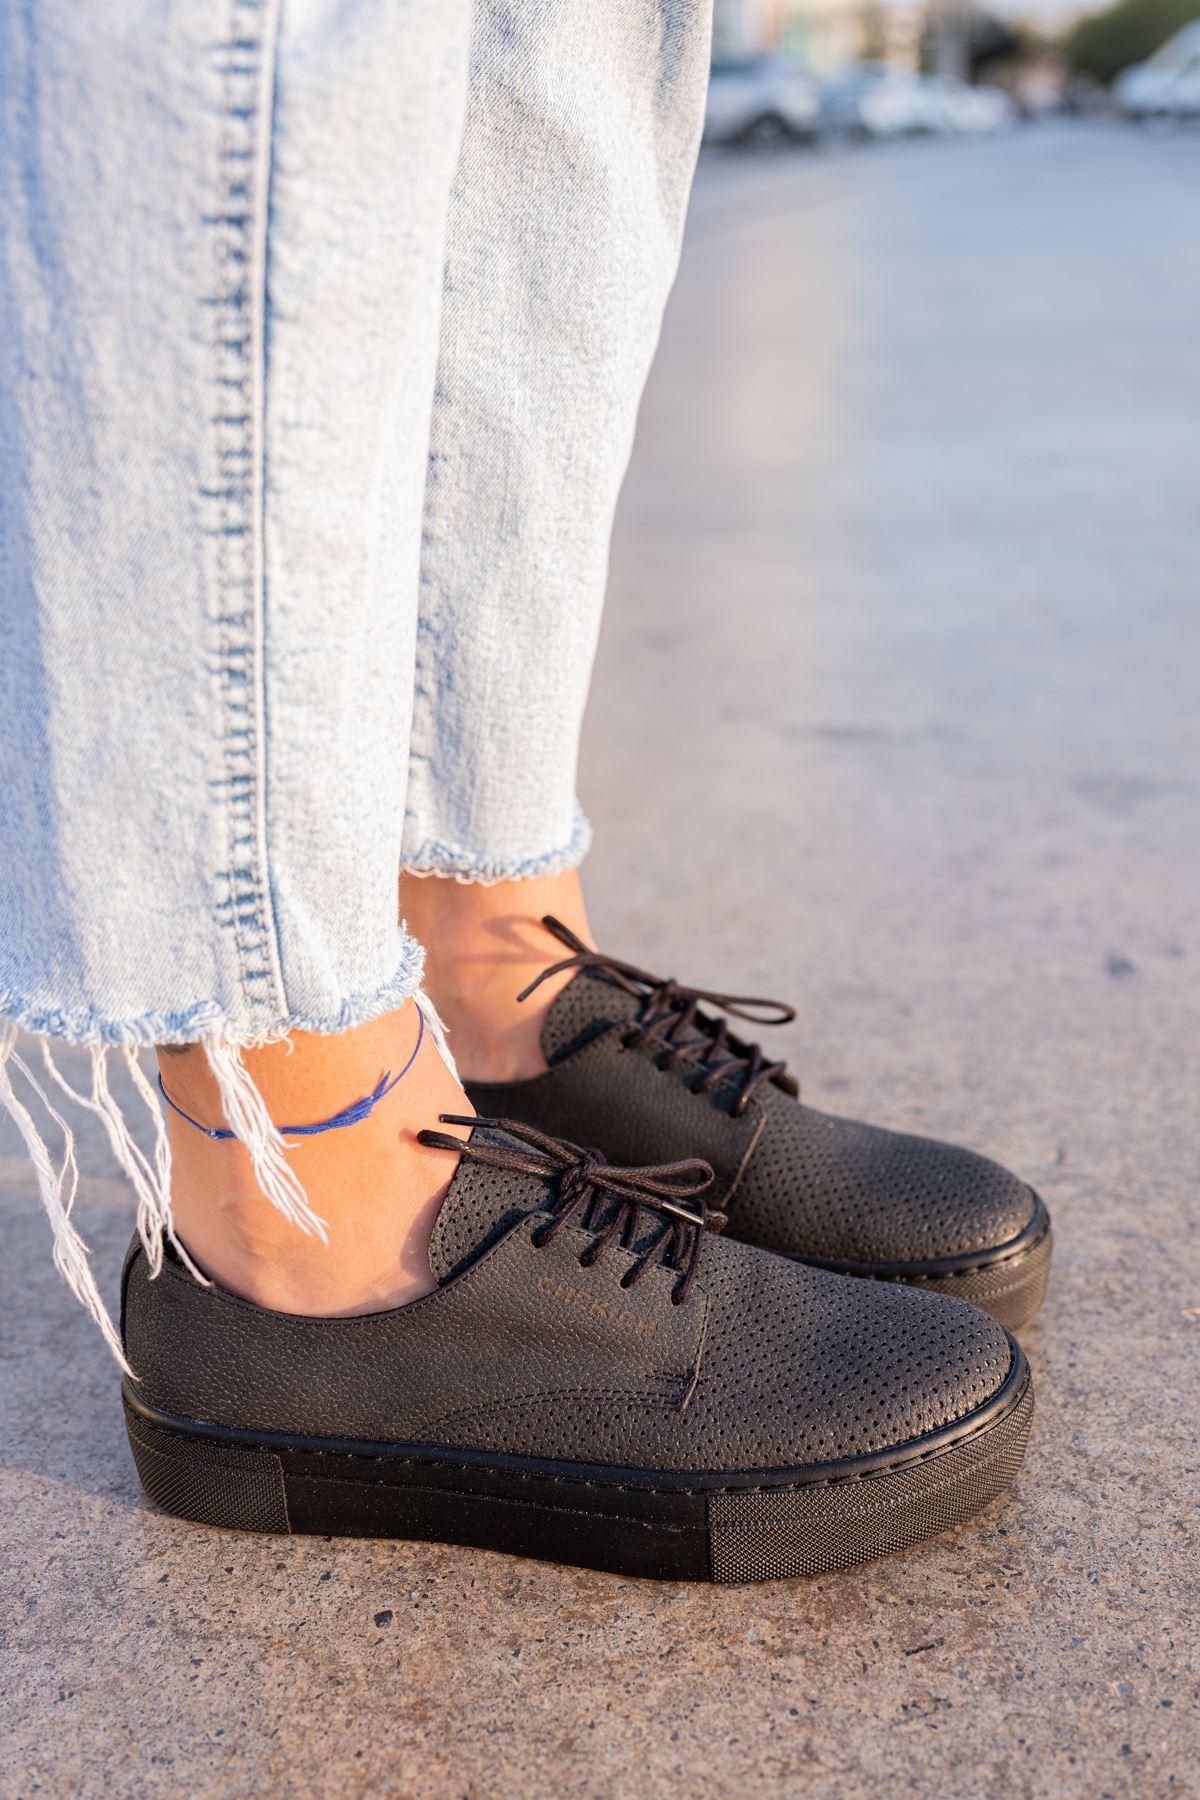 Chekich CH061 ST Kadın Ayakkabı SIYAH